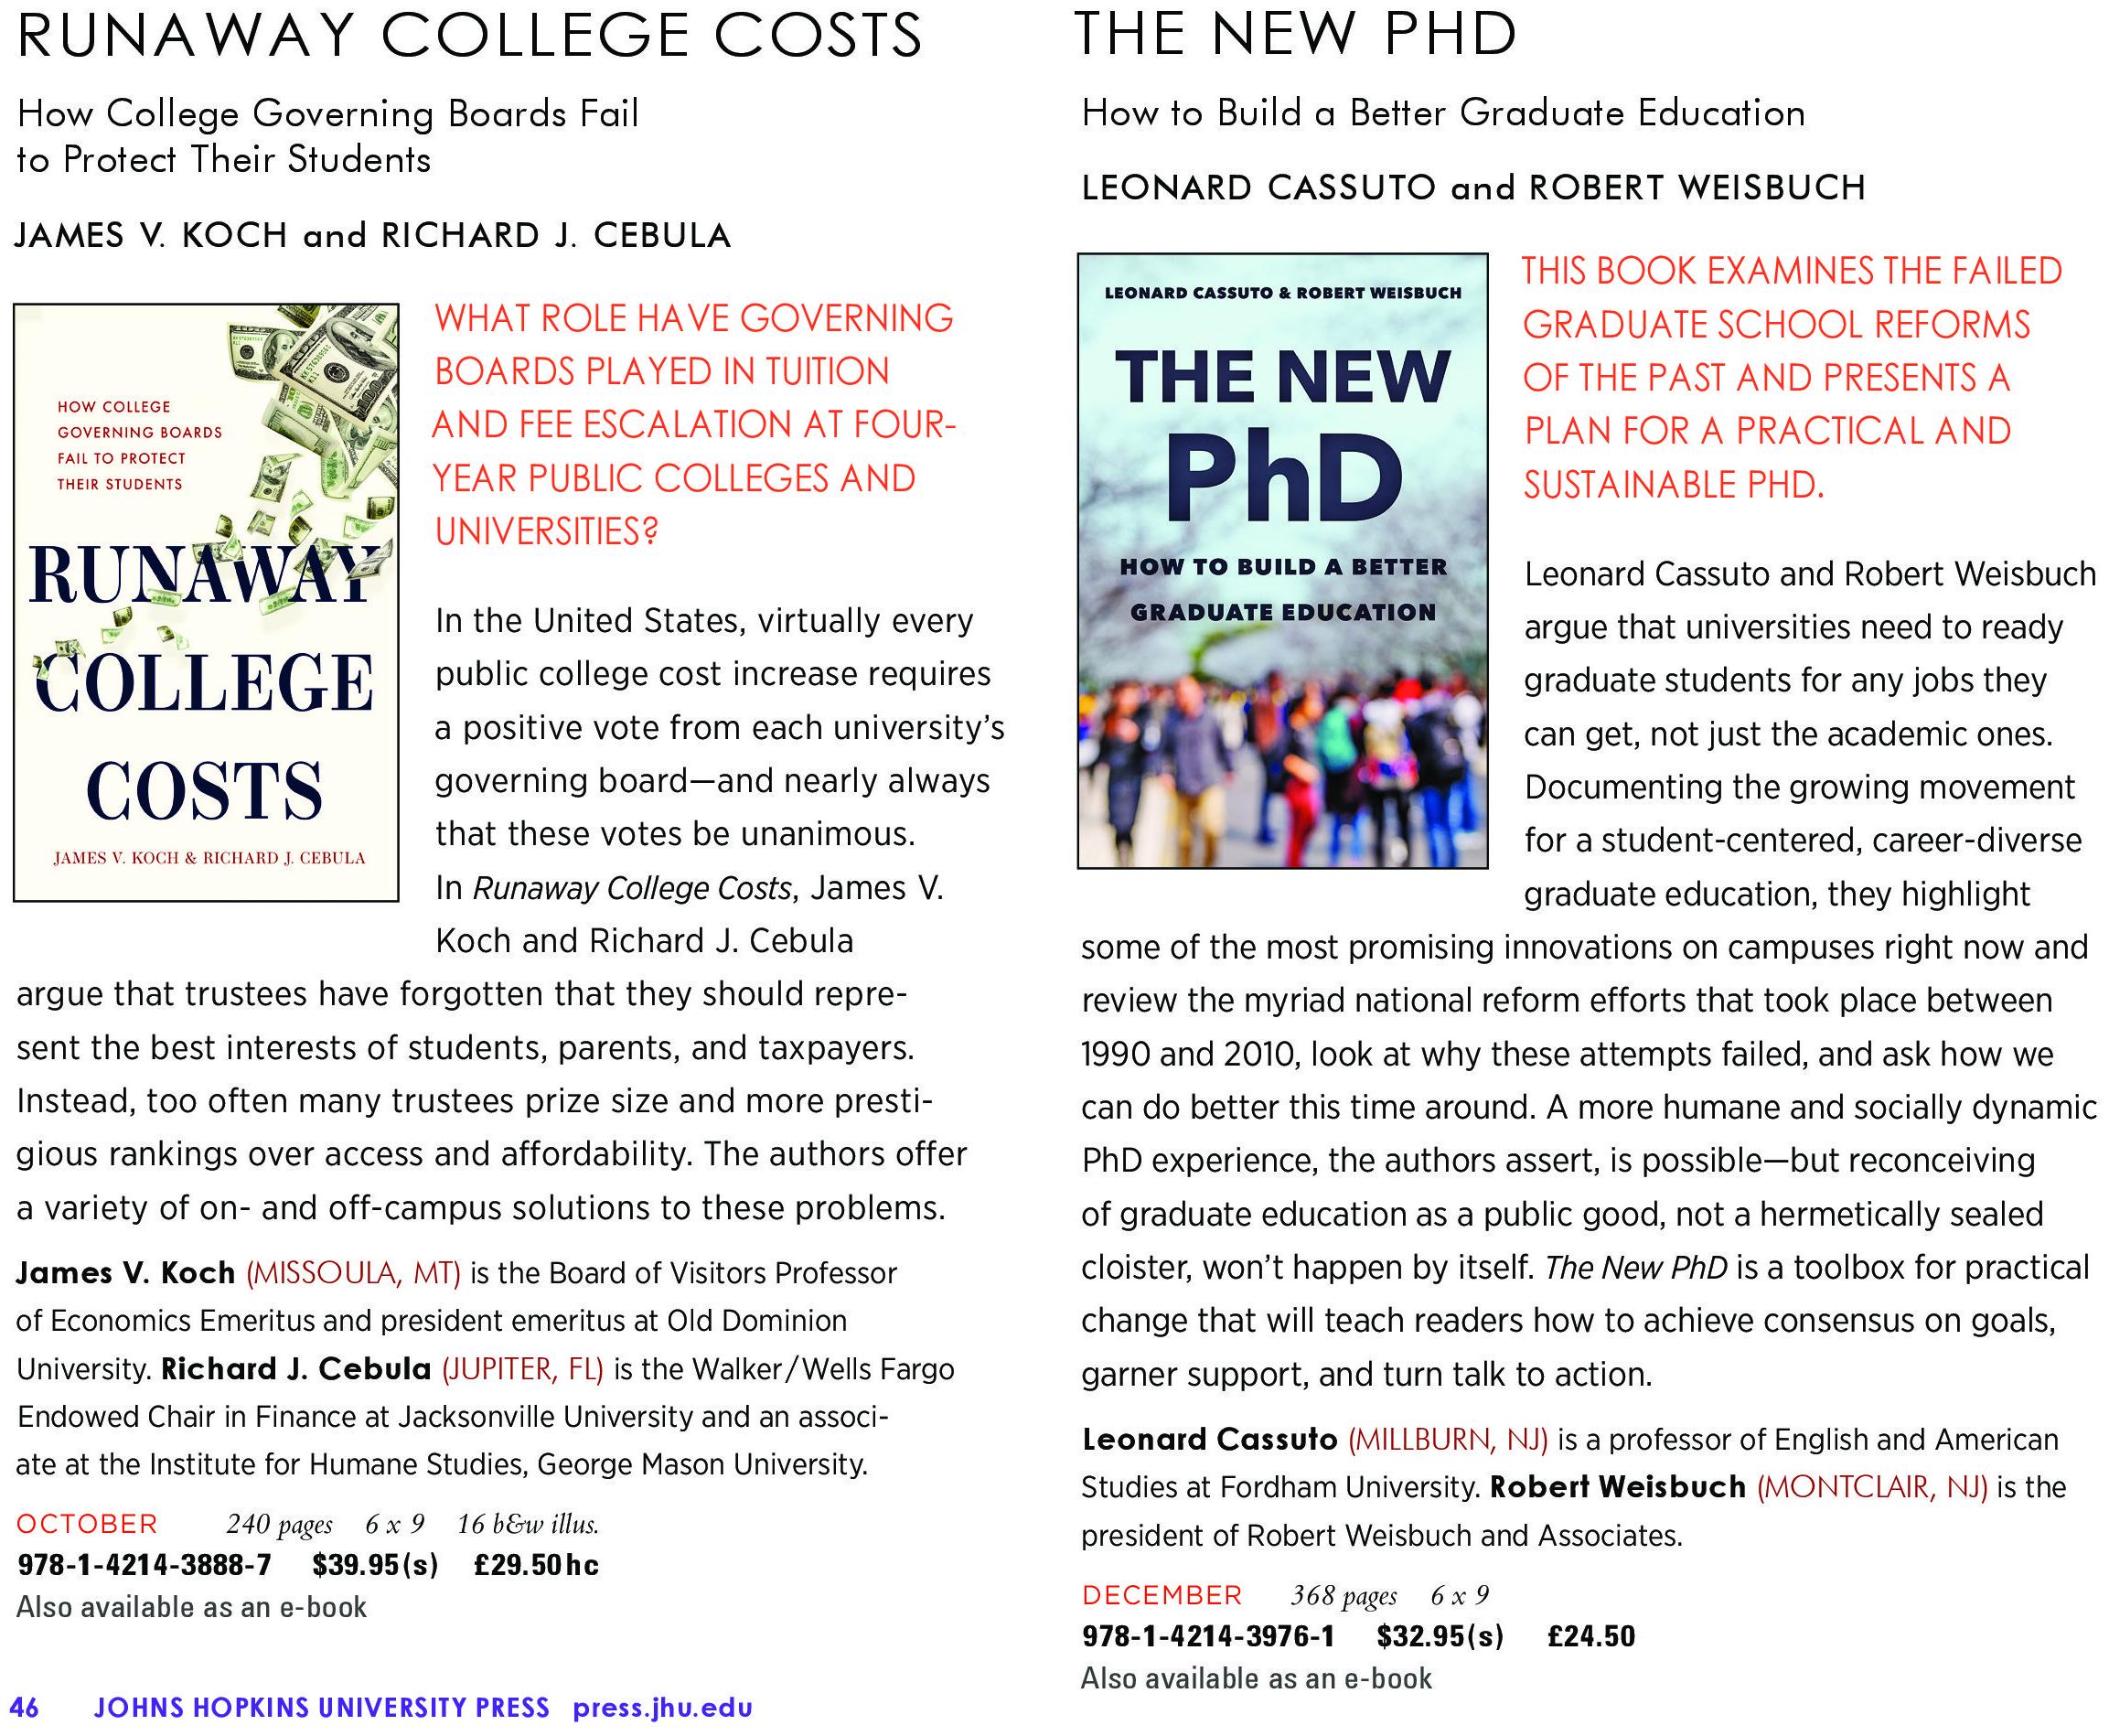 Johns Hopkins University Press New Titles for Fall / Winter 2020